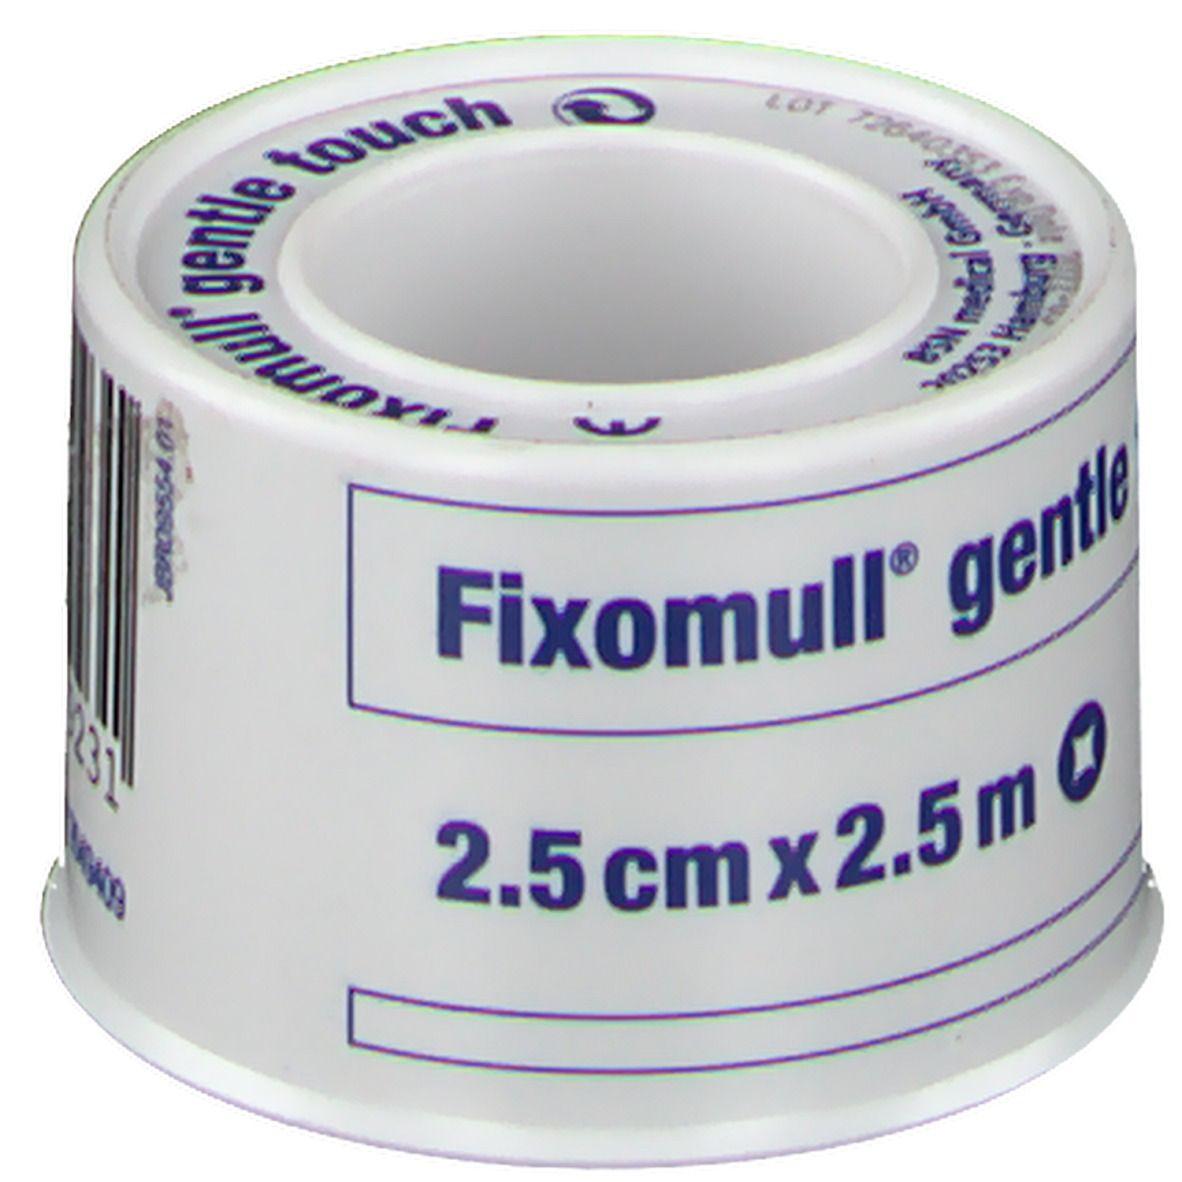 Fixomull® gentle touch 2,5 cm x 2,5 cm